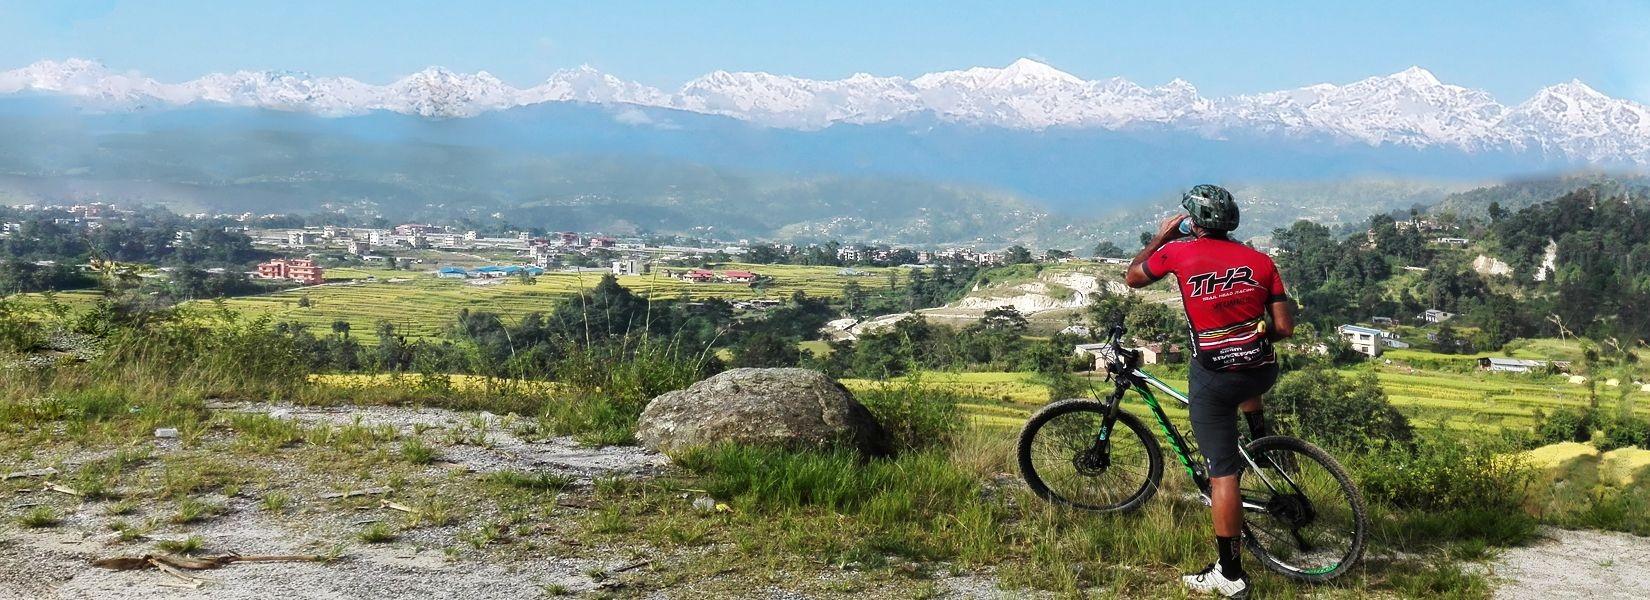 Kathmandu Mountainbike Tour, Kathmandu Tour, kathmandu cycling tour